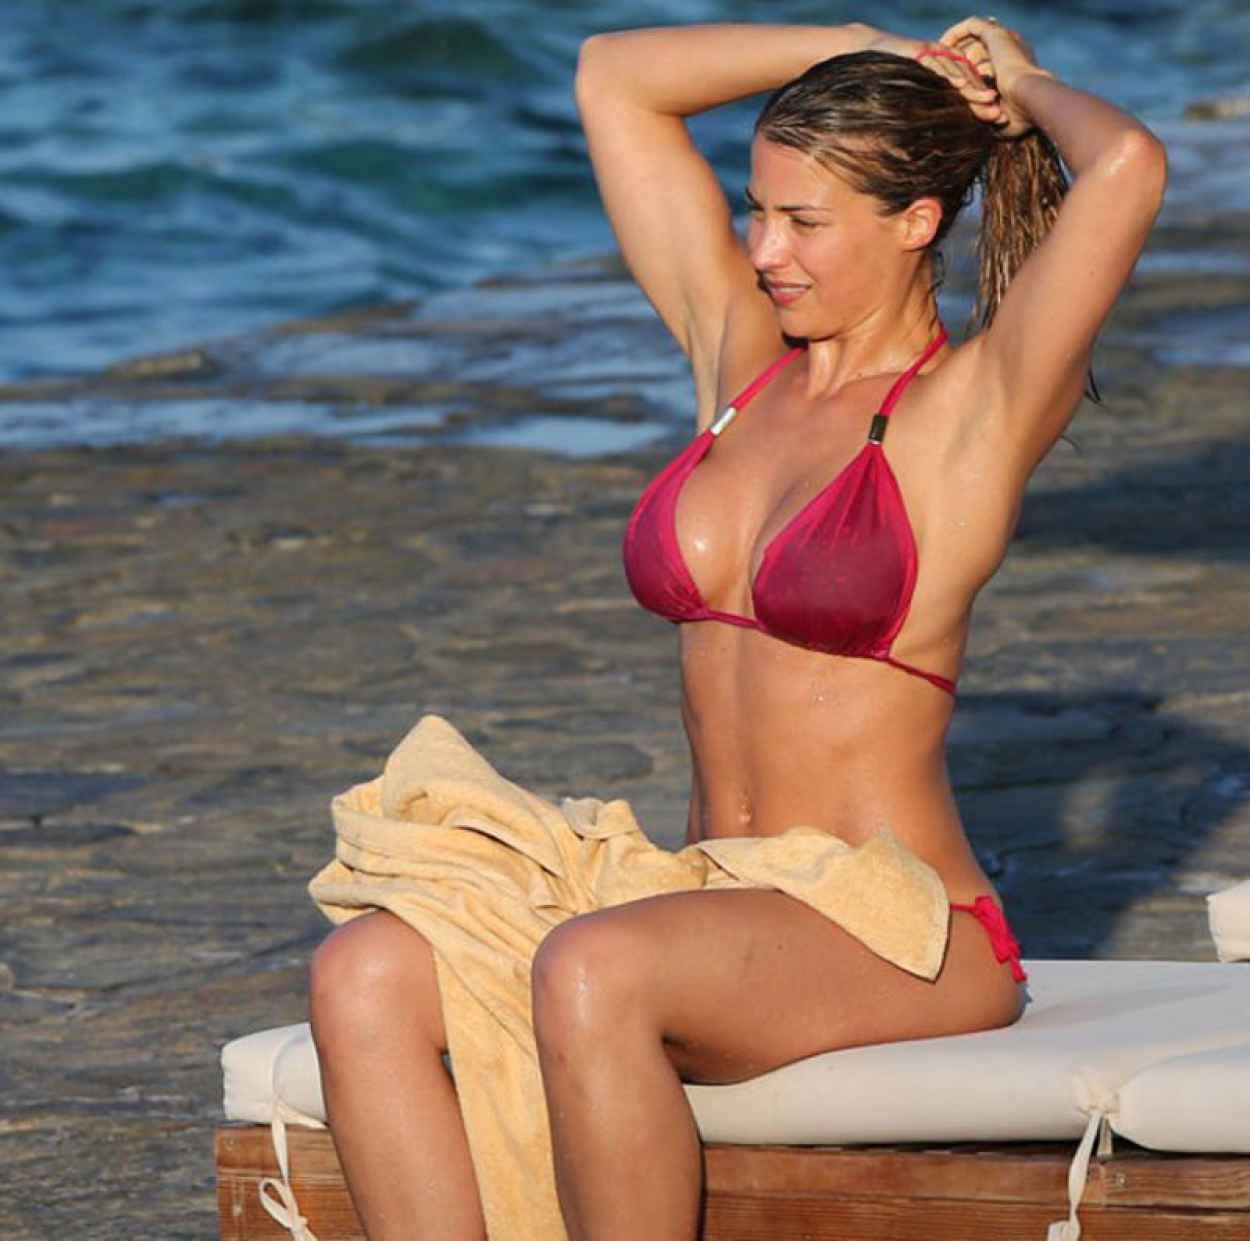 Gemma Atkinson in Pink Bikini - March 2015-2